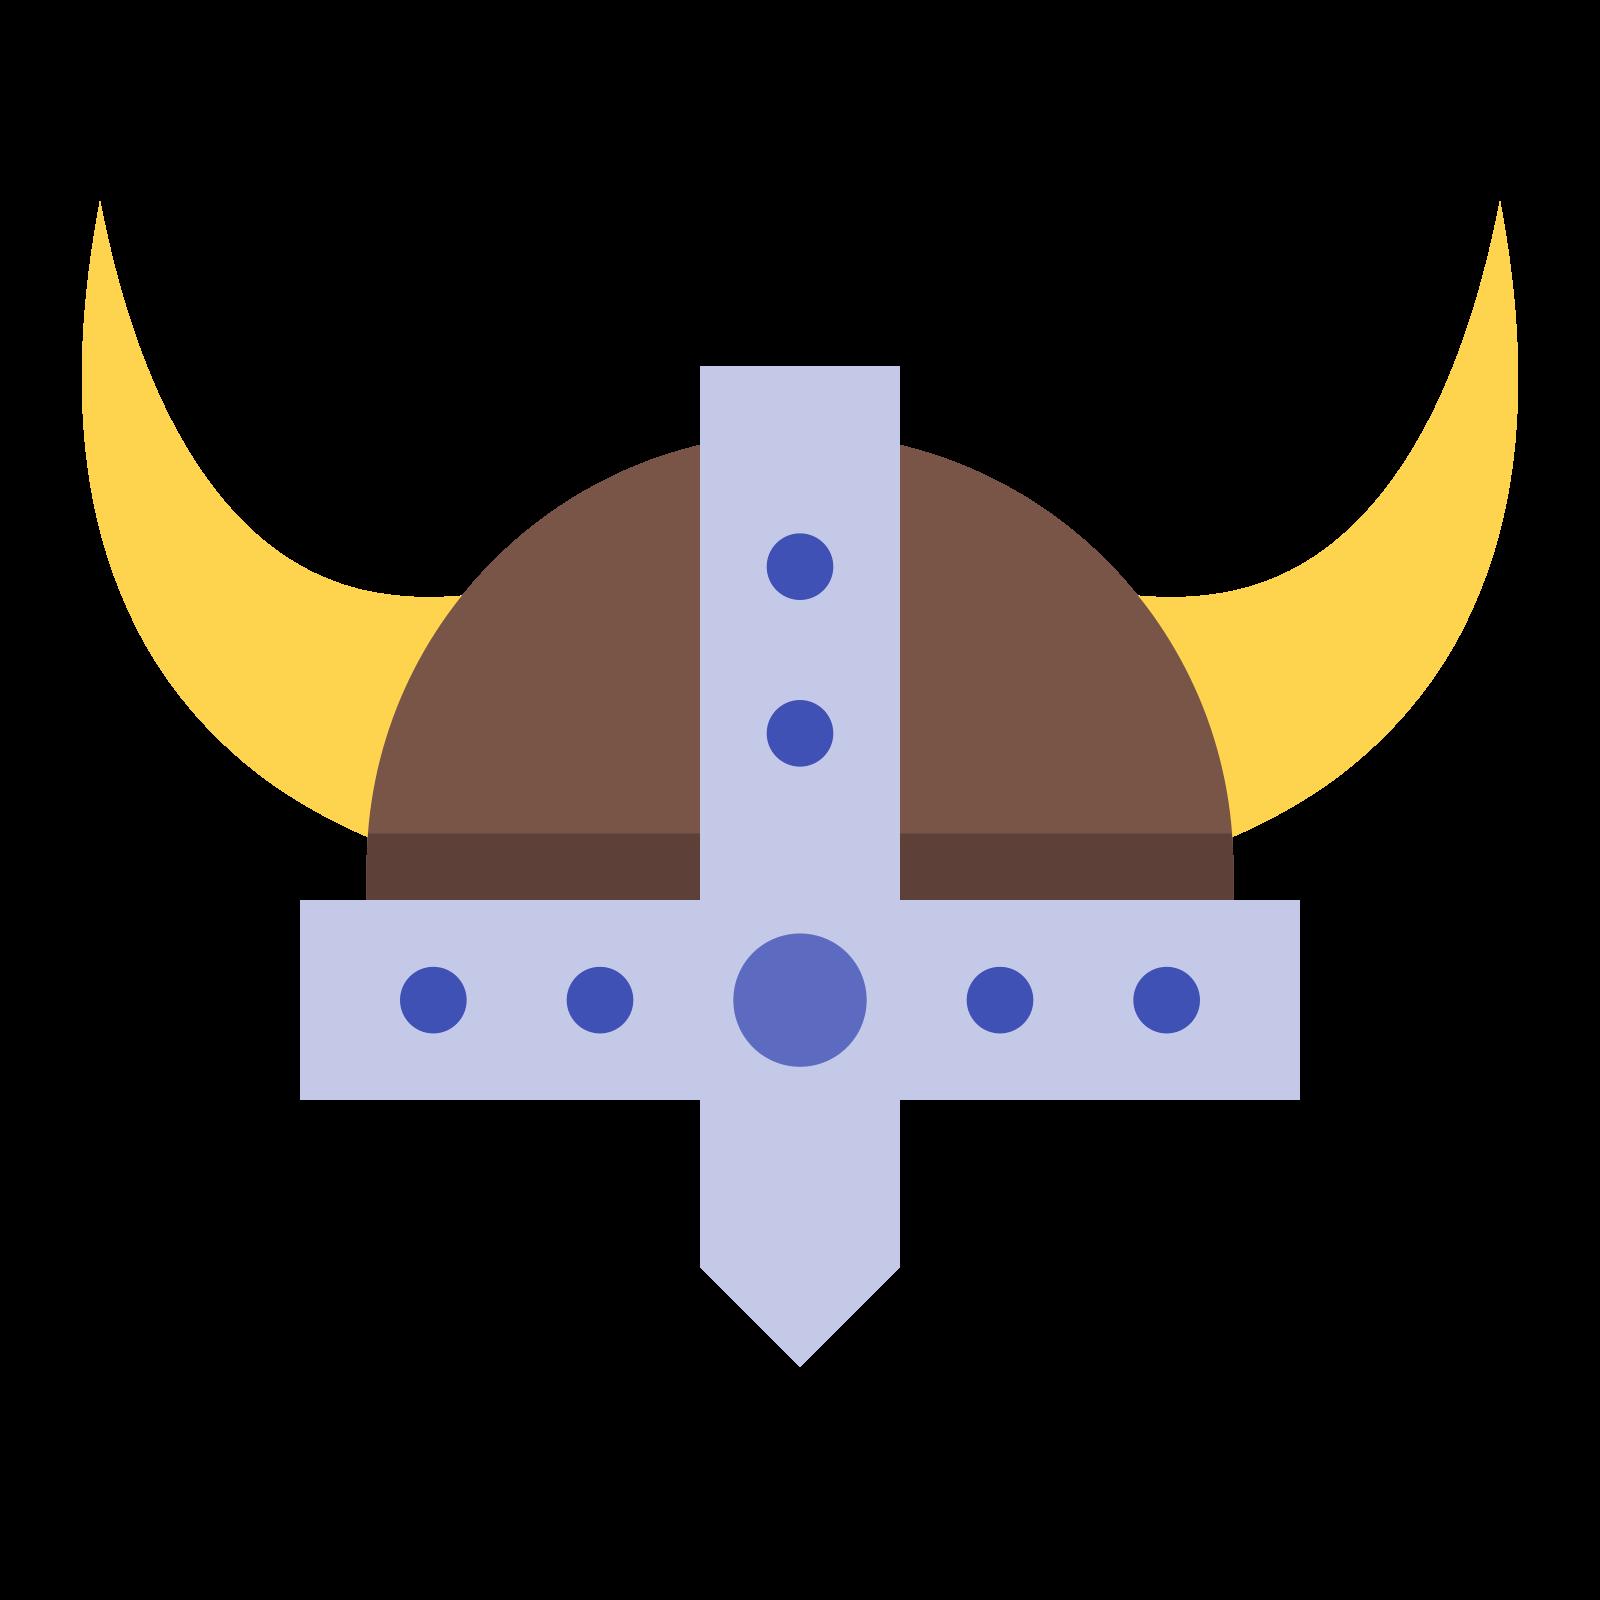 clip art free stock Viking svg emoji. Helmet cones download gratuito